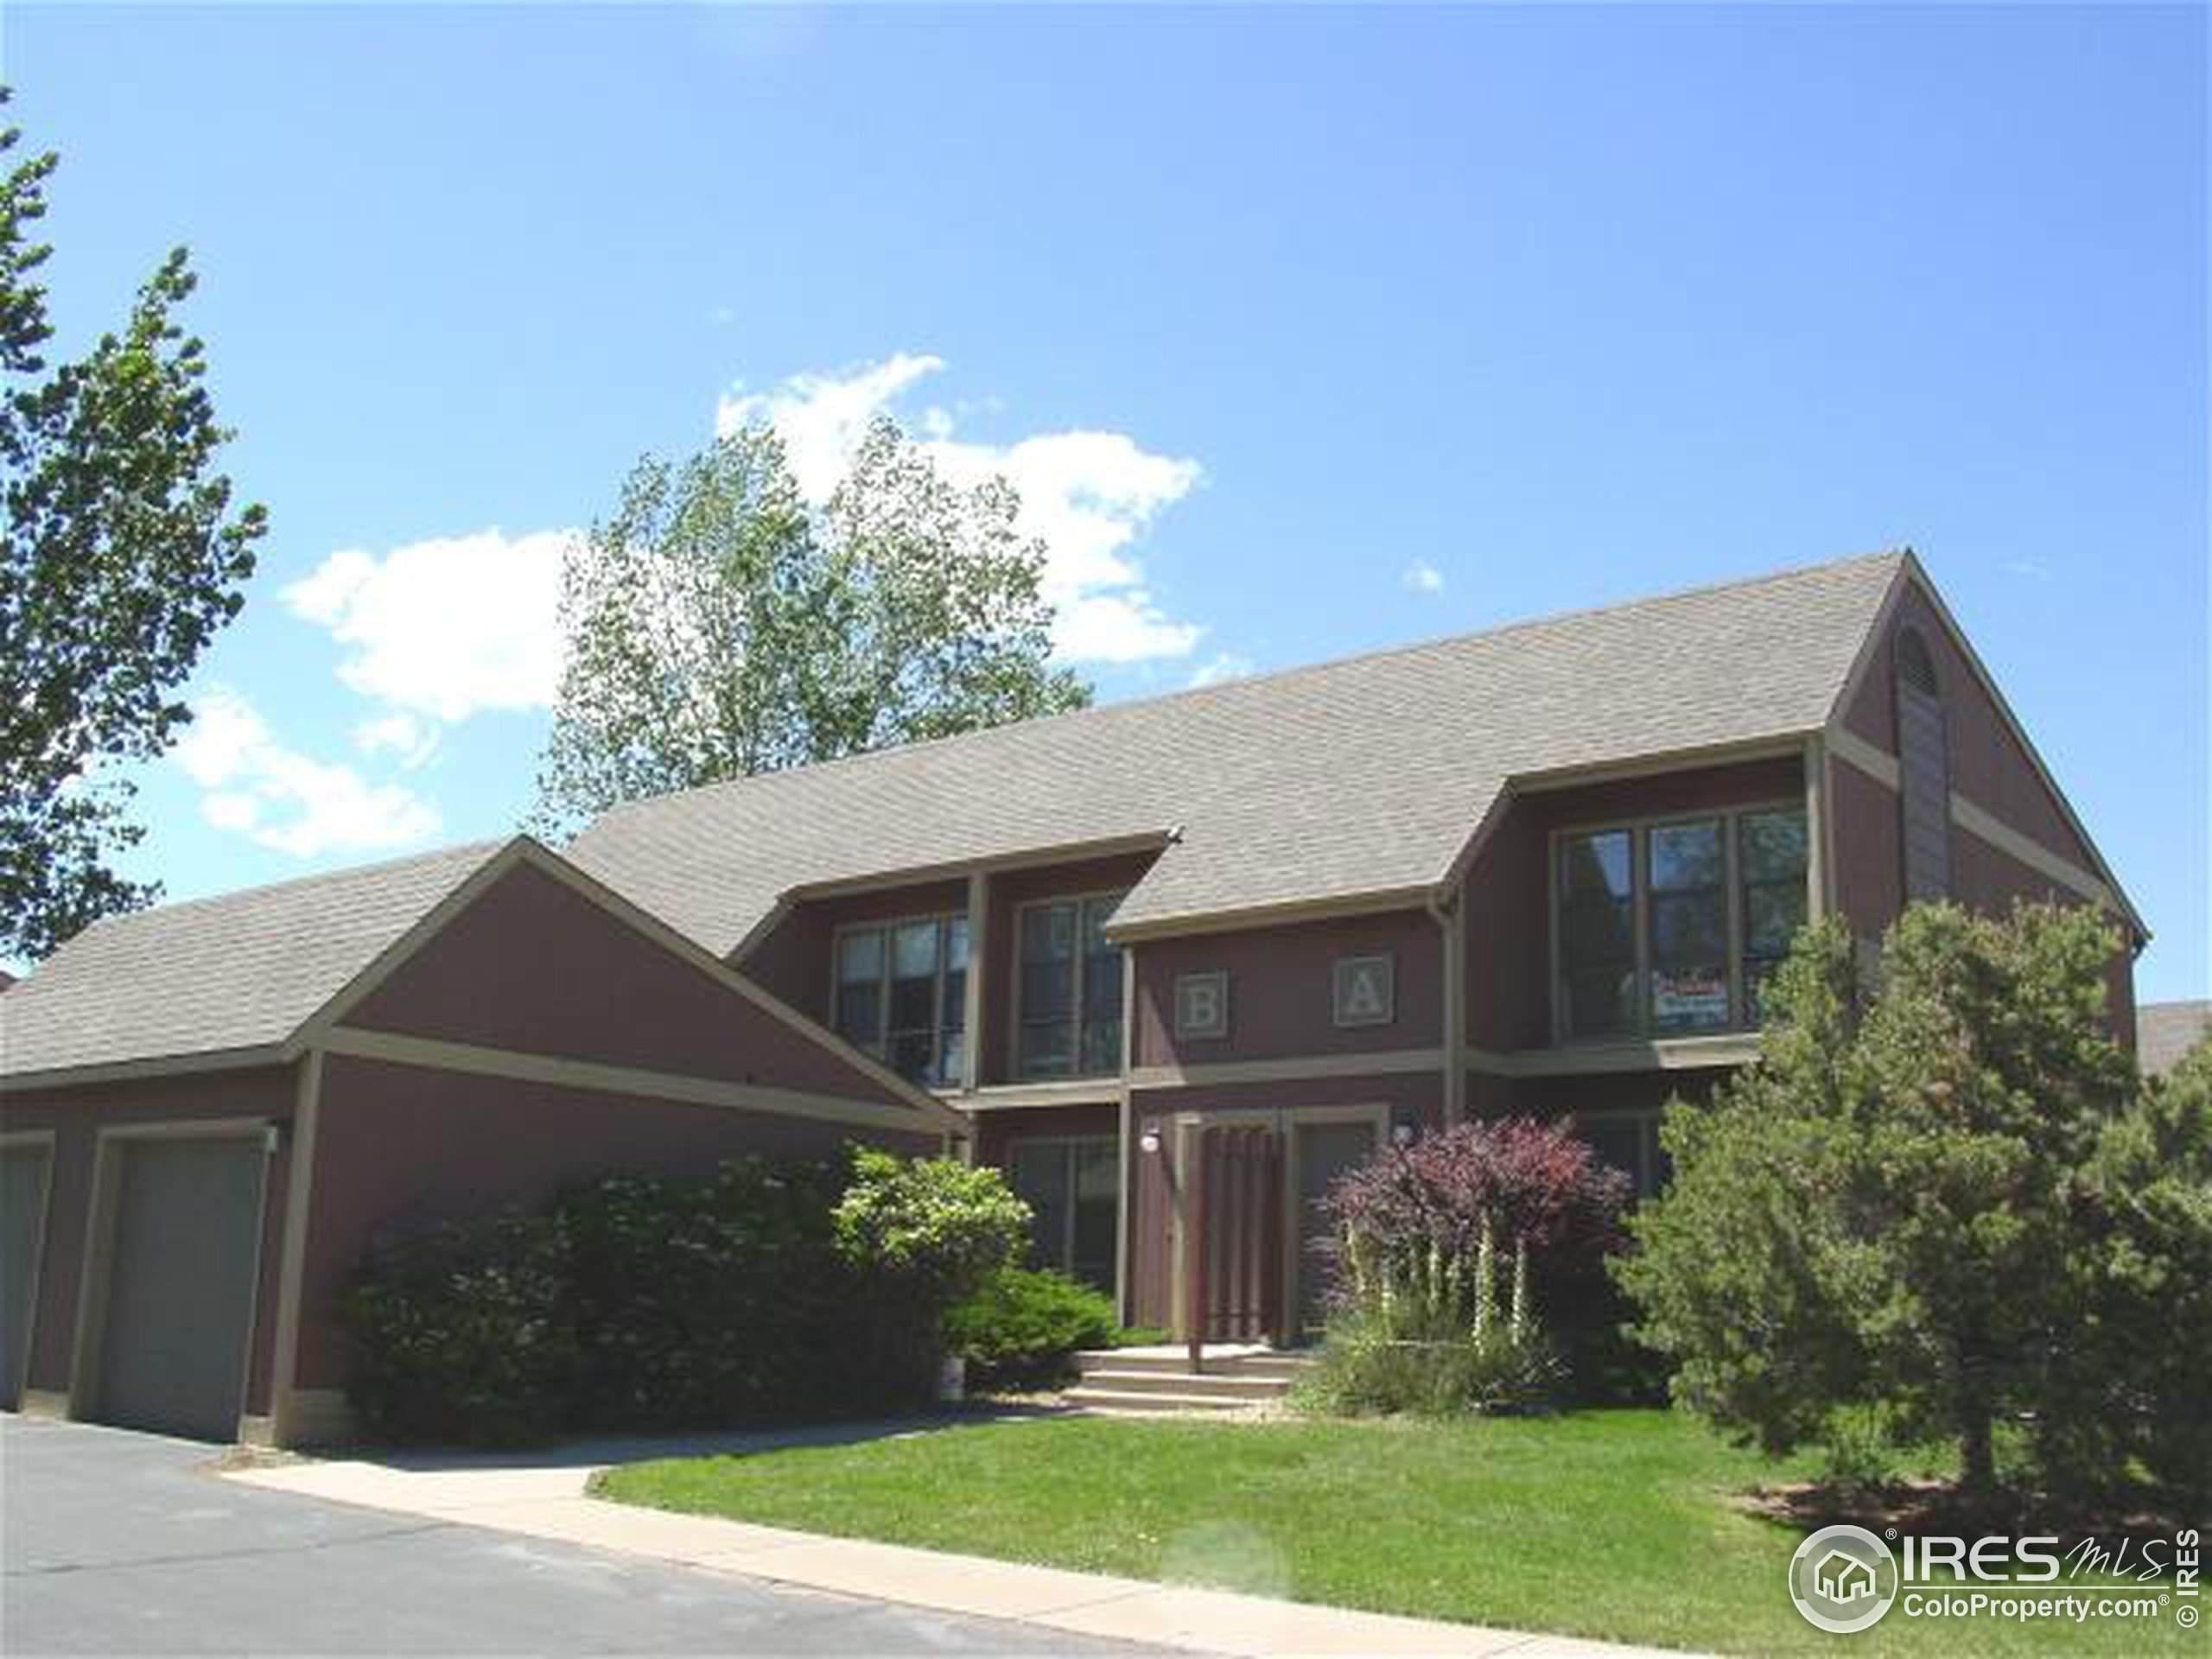 413 Camino Del Mundo, Fort Collins, CO 80524 (#877050) :: The Peak Properties Group